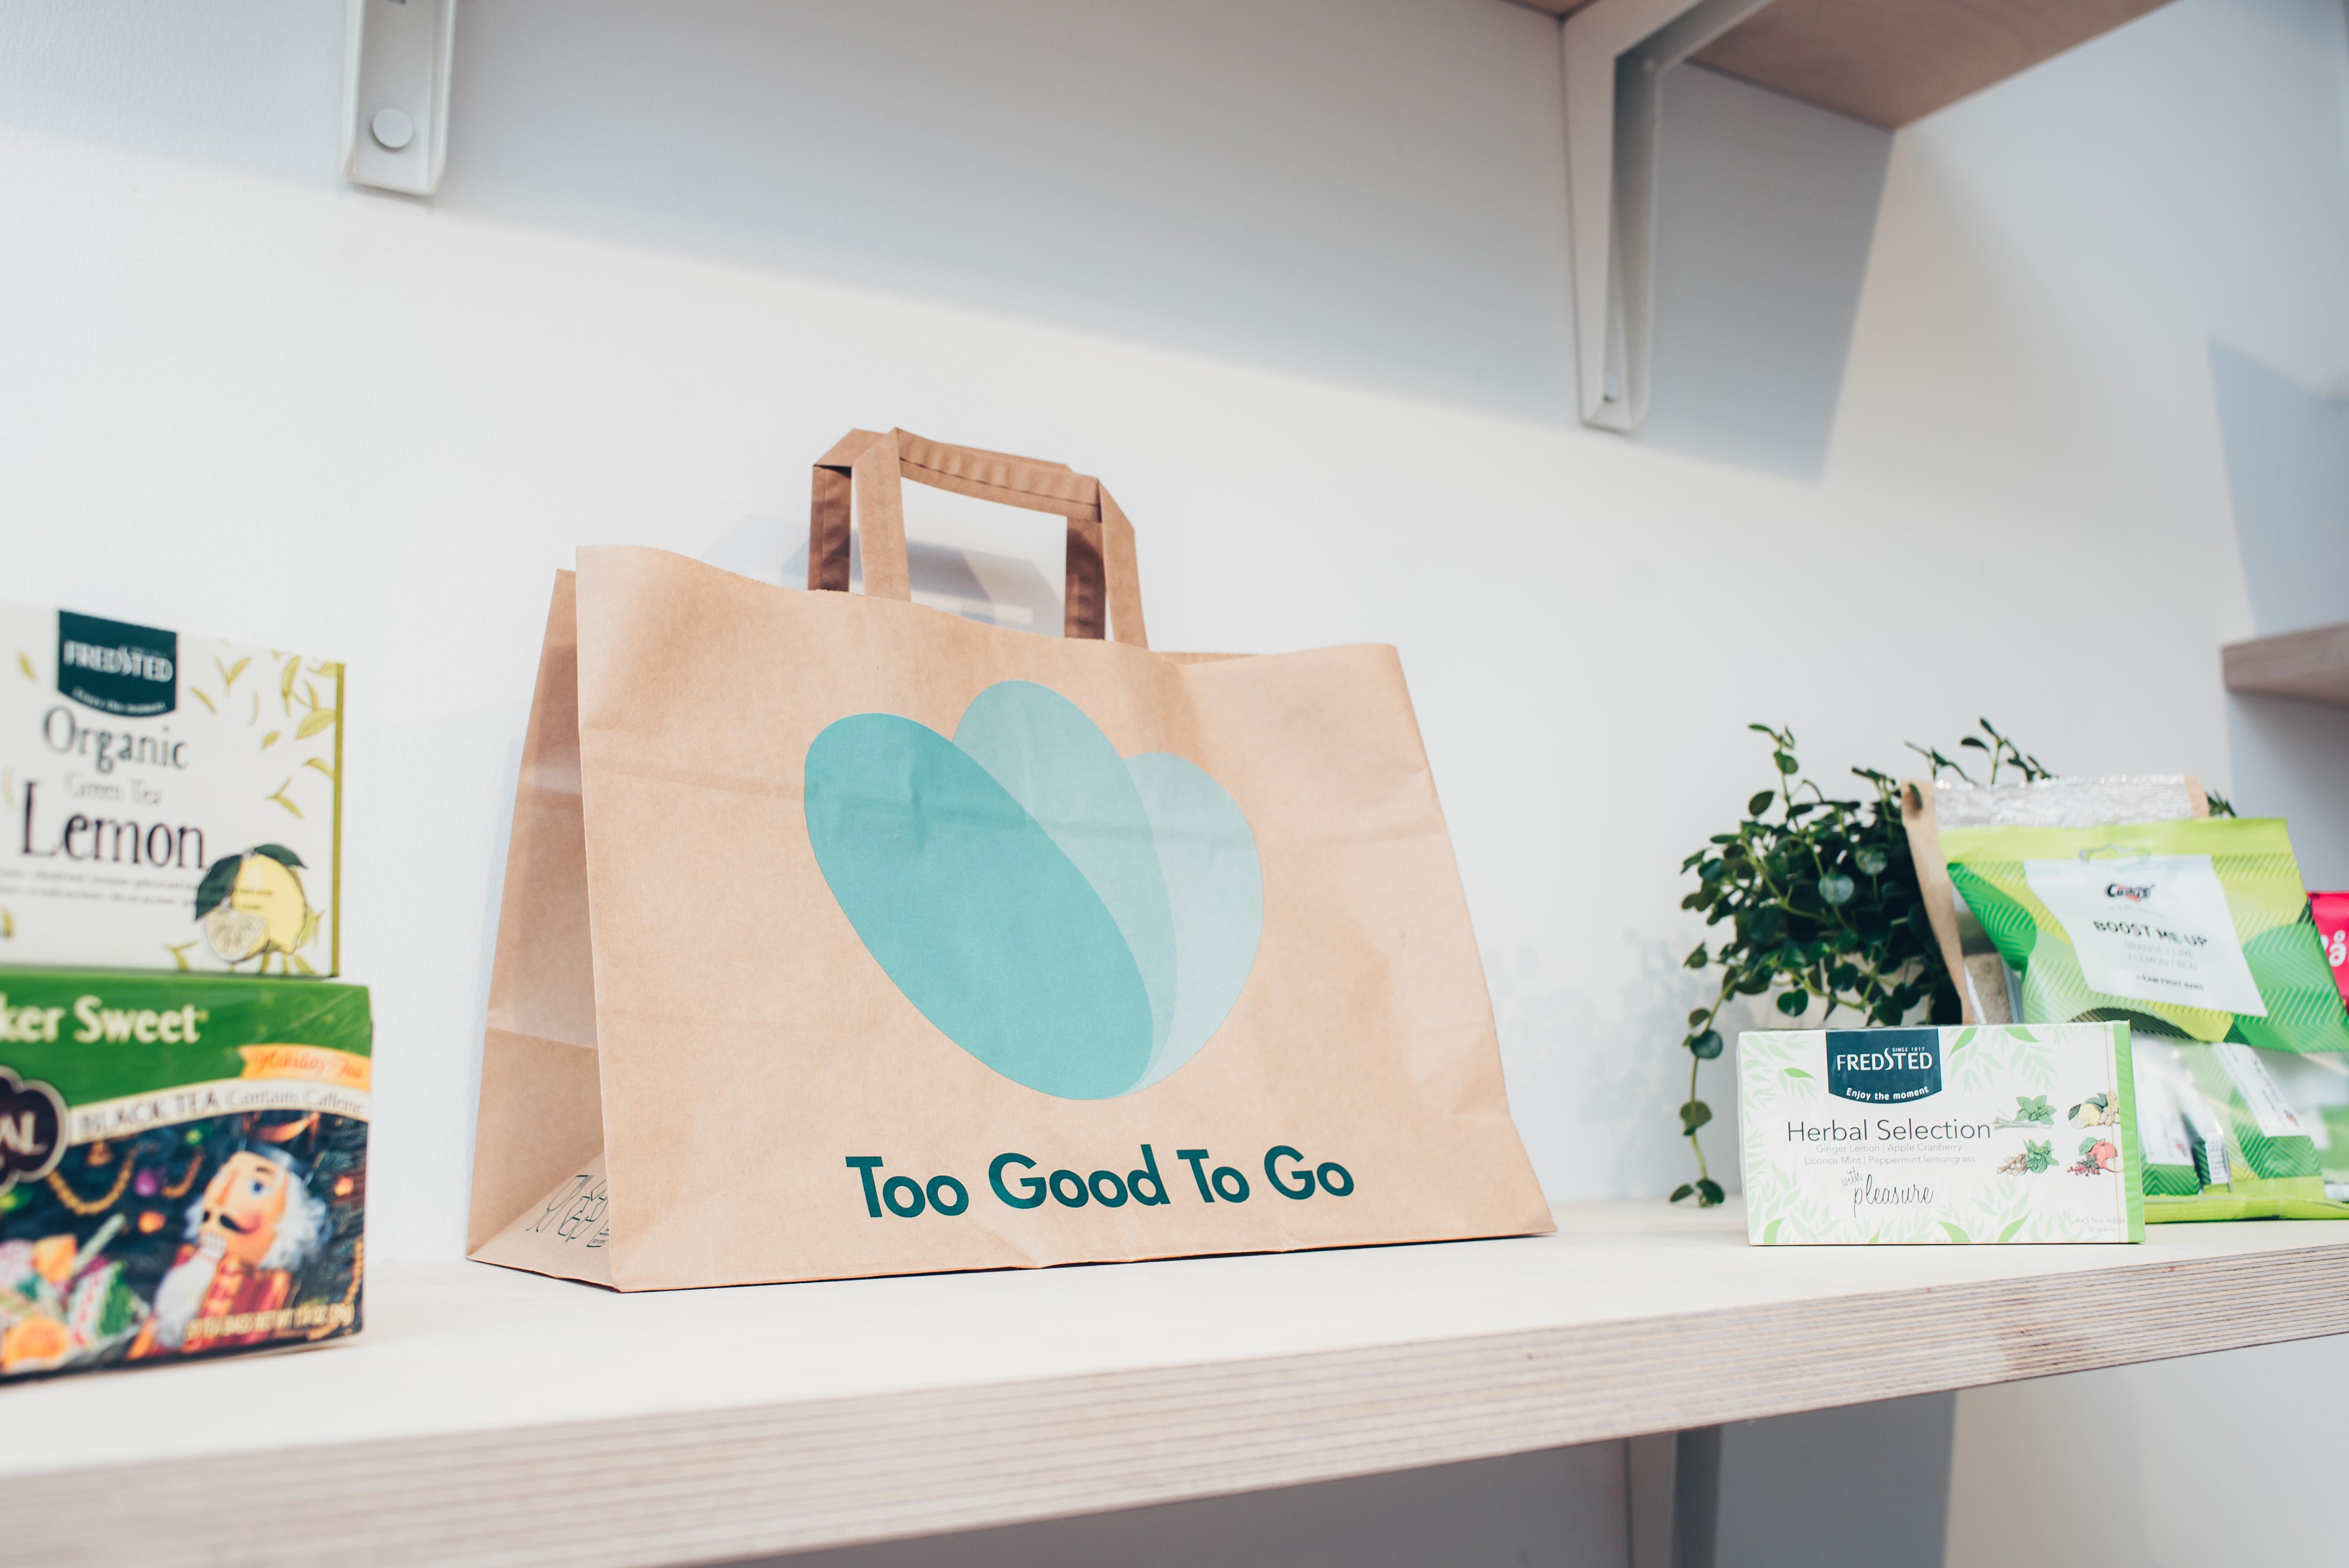 too-good-to-go-app-combatte-spreco-alimentare-2